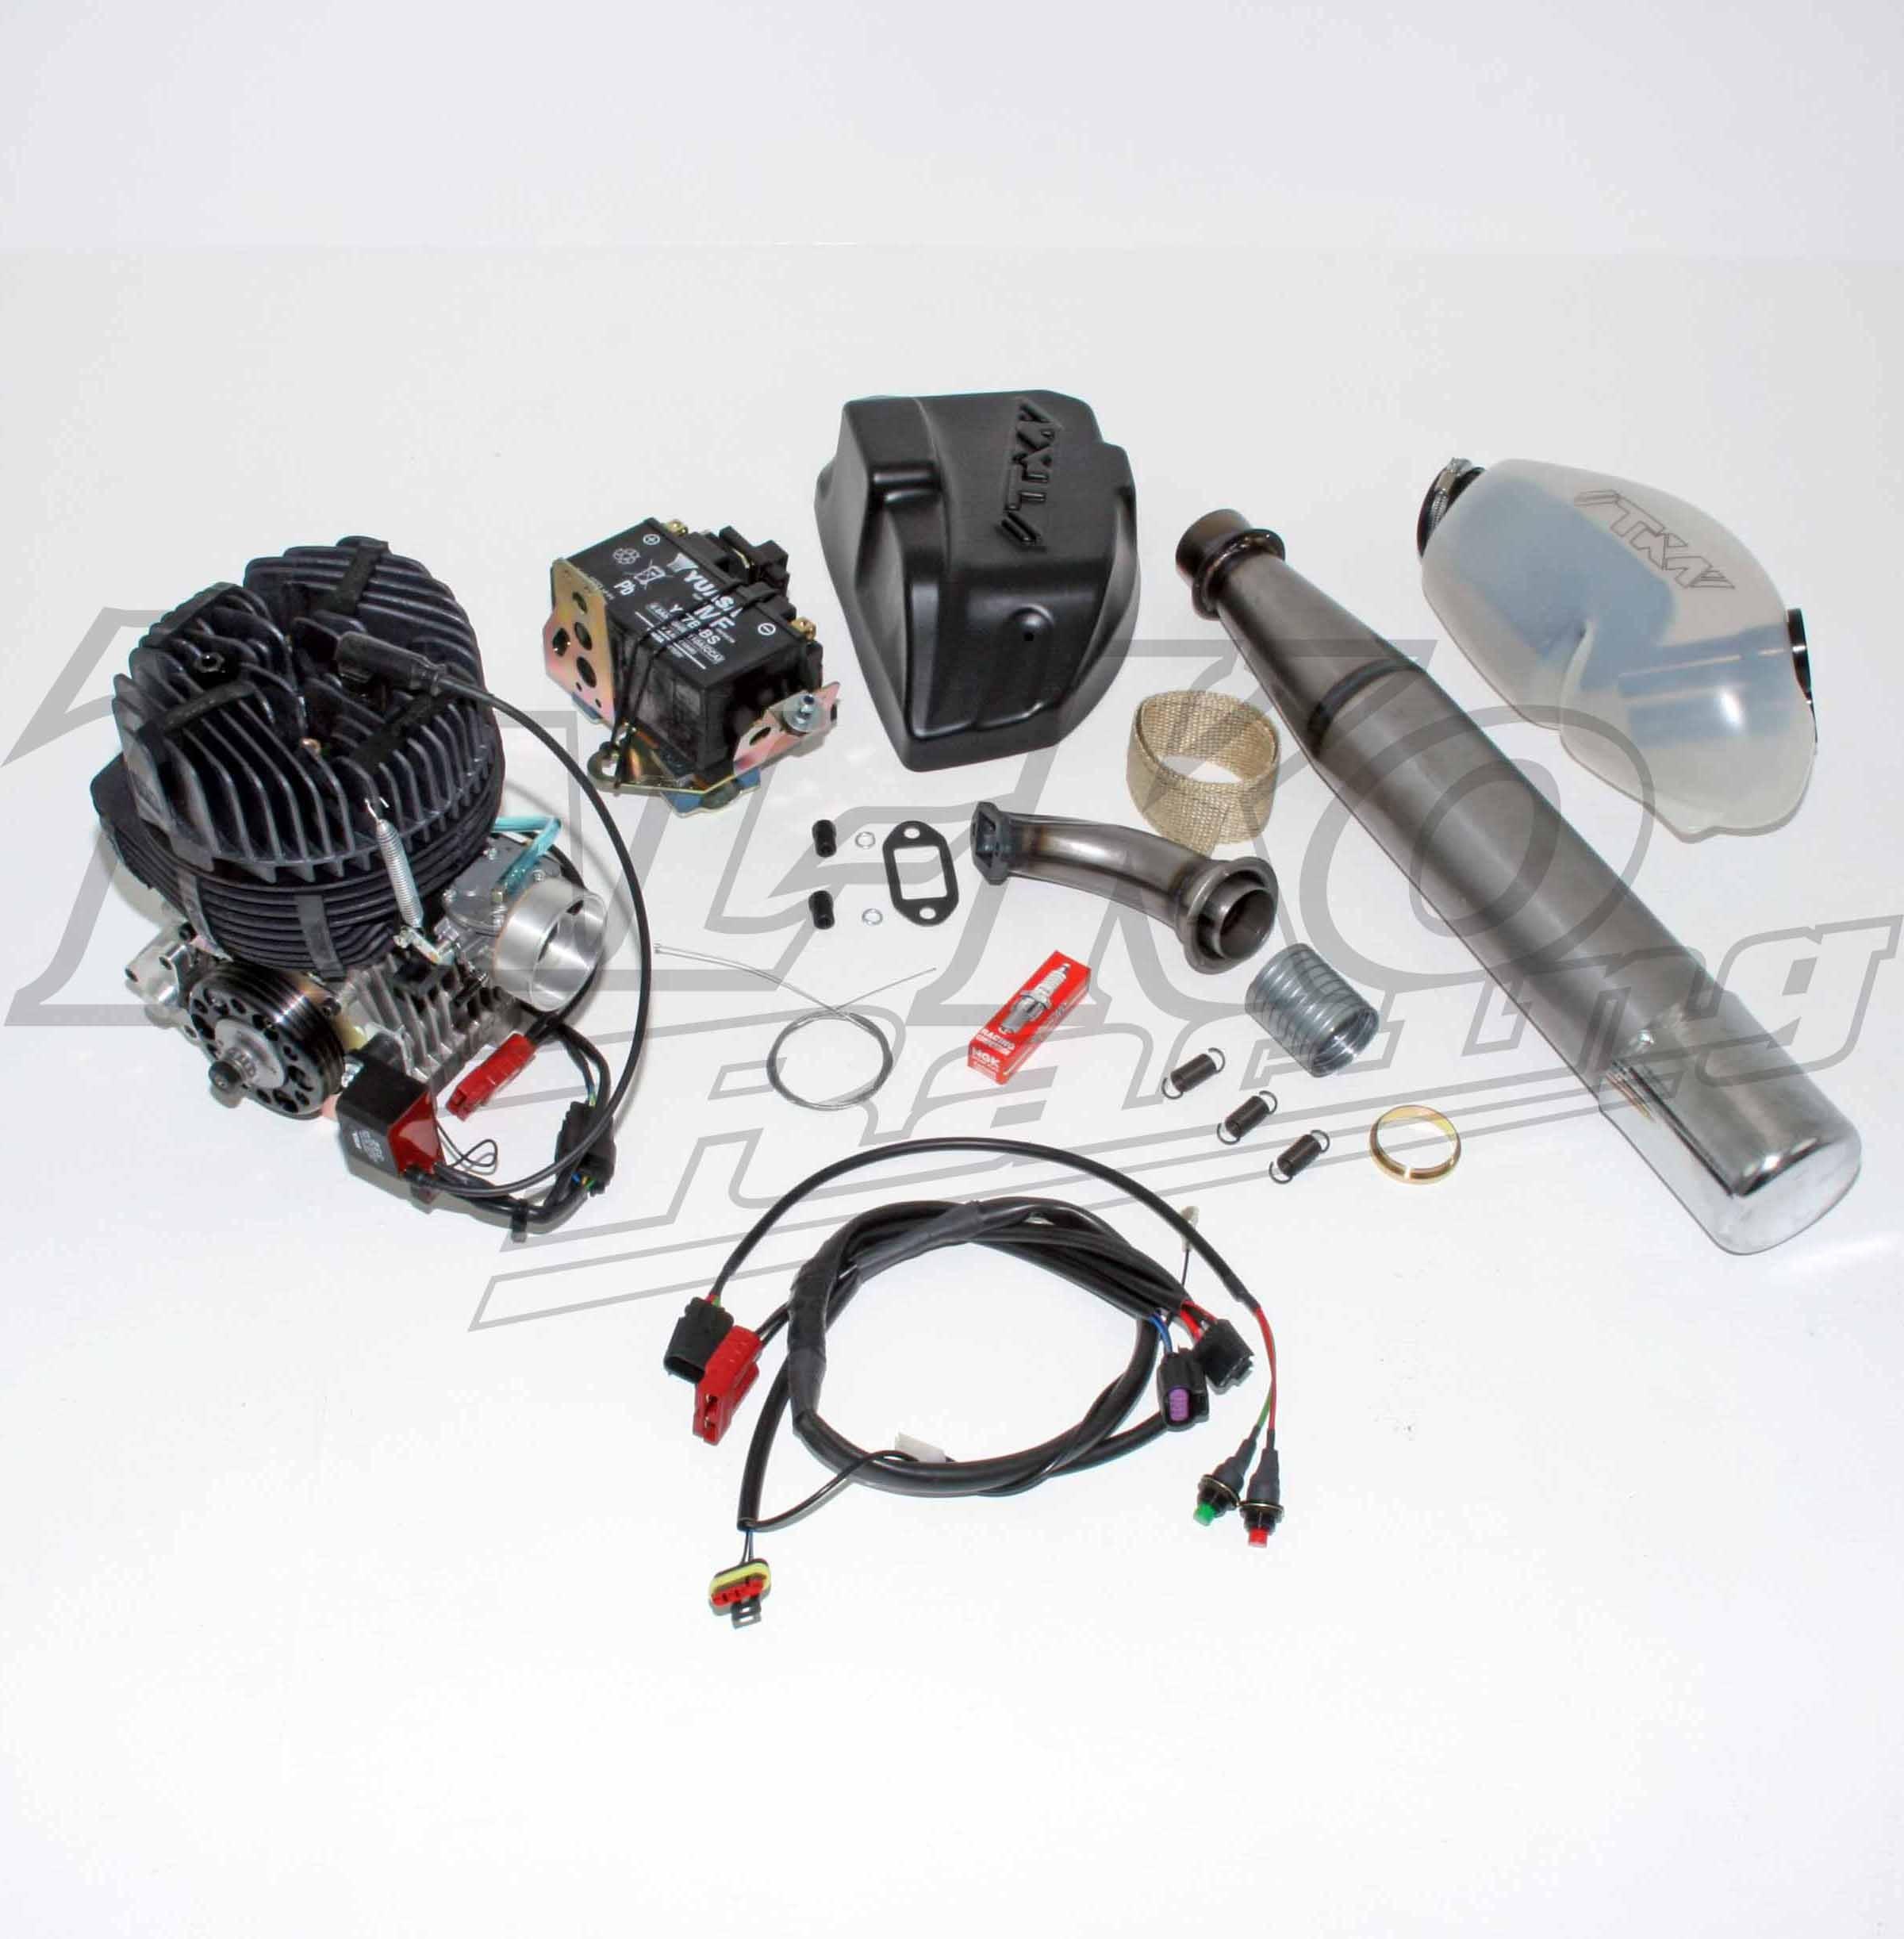 TKM BT82 115cc SENIOR EXTREME ENGINE TAG V CLUTCH DRIVE